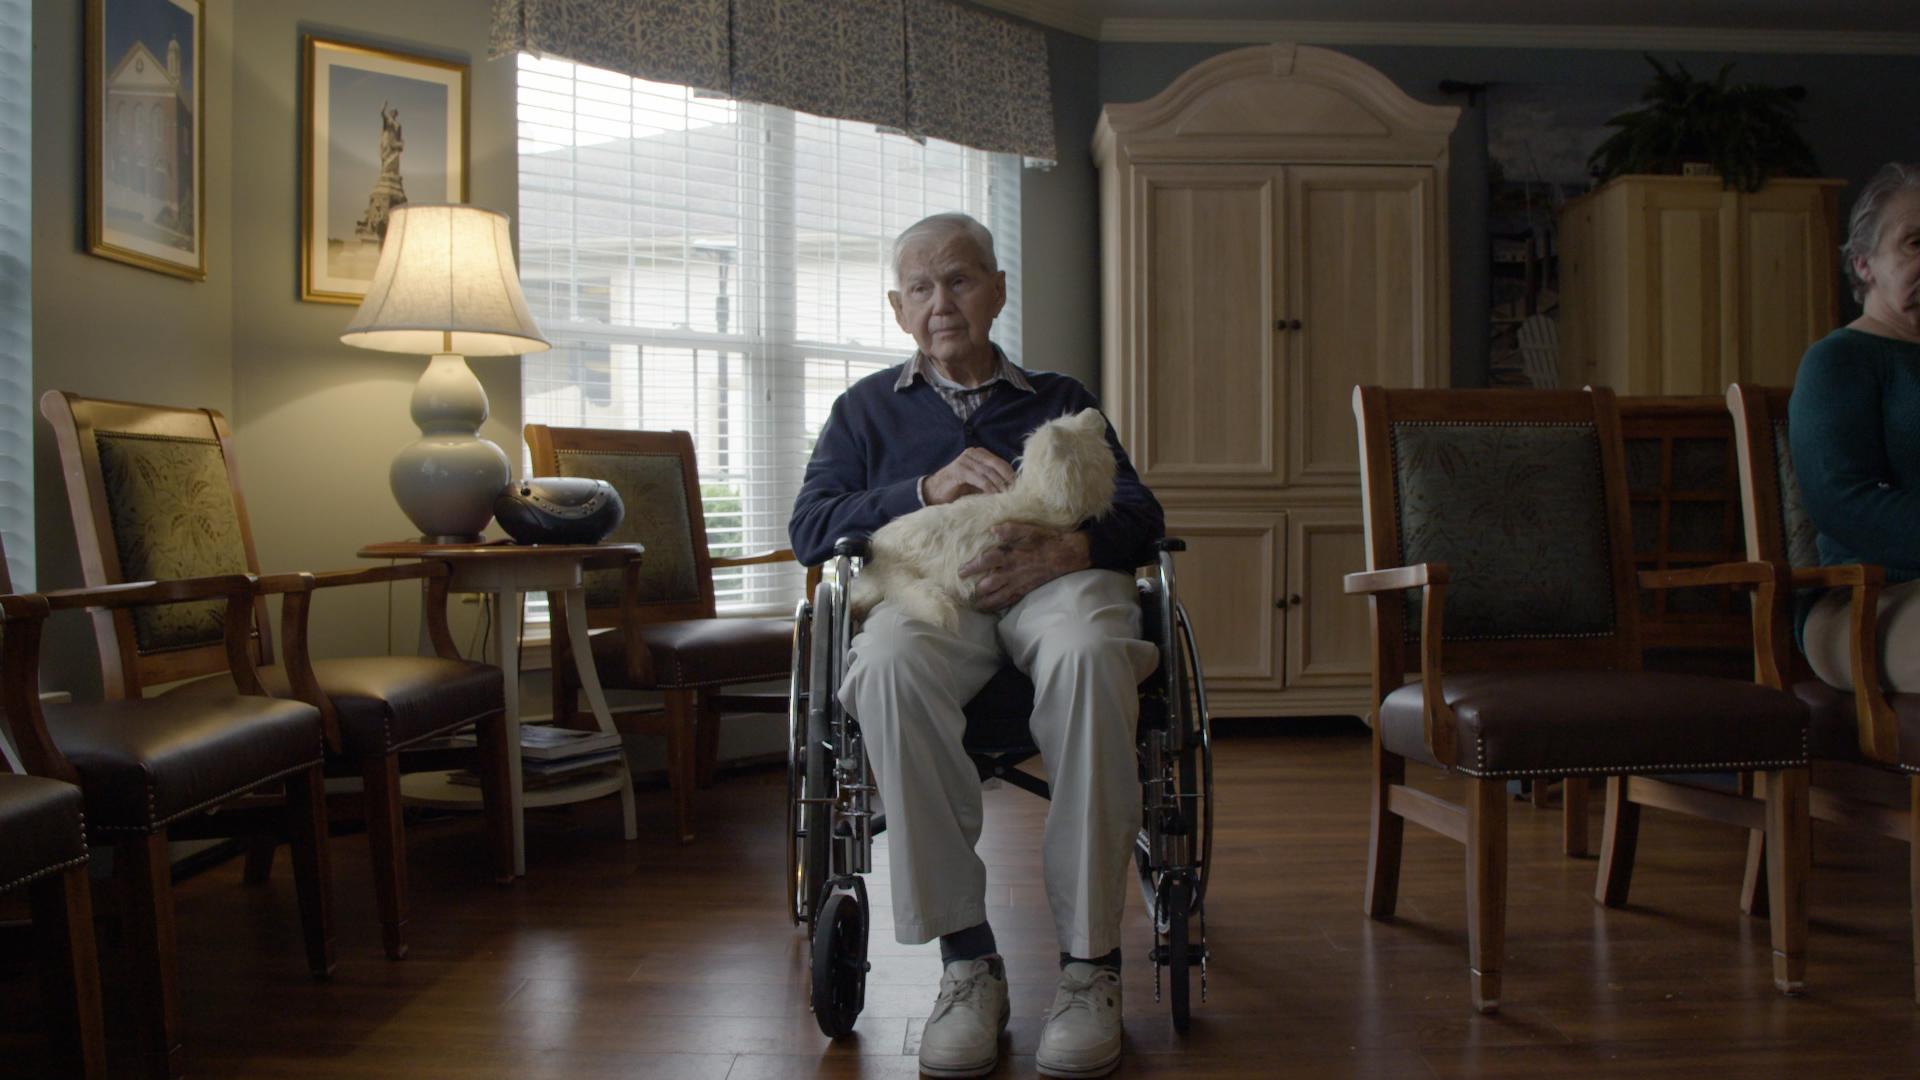 Robotic Pets Are Helping Dementia Patients